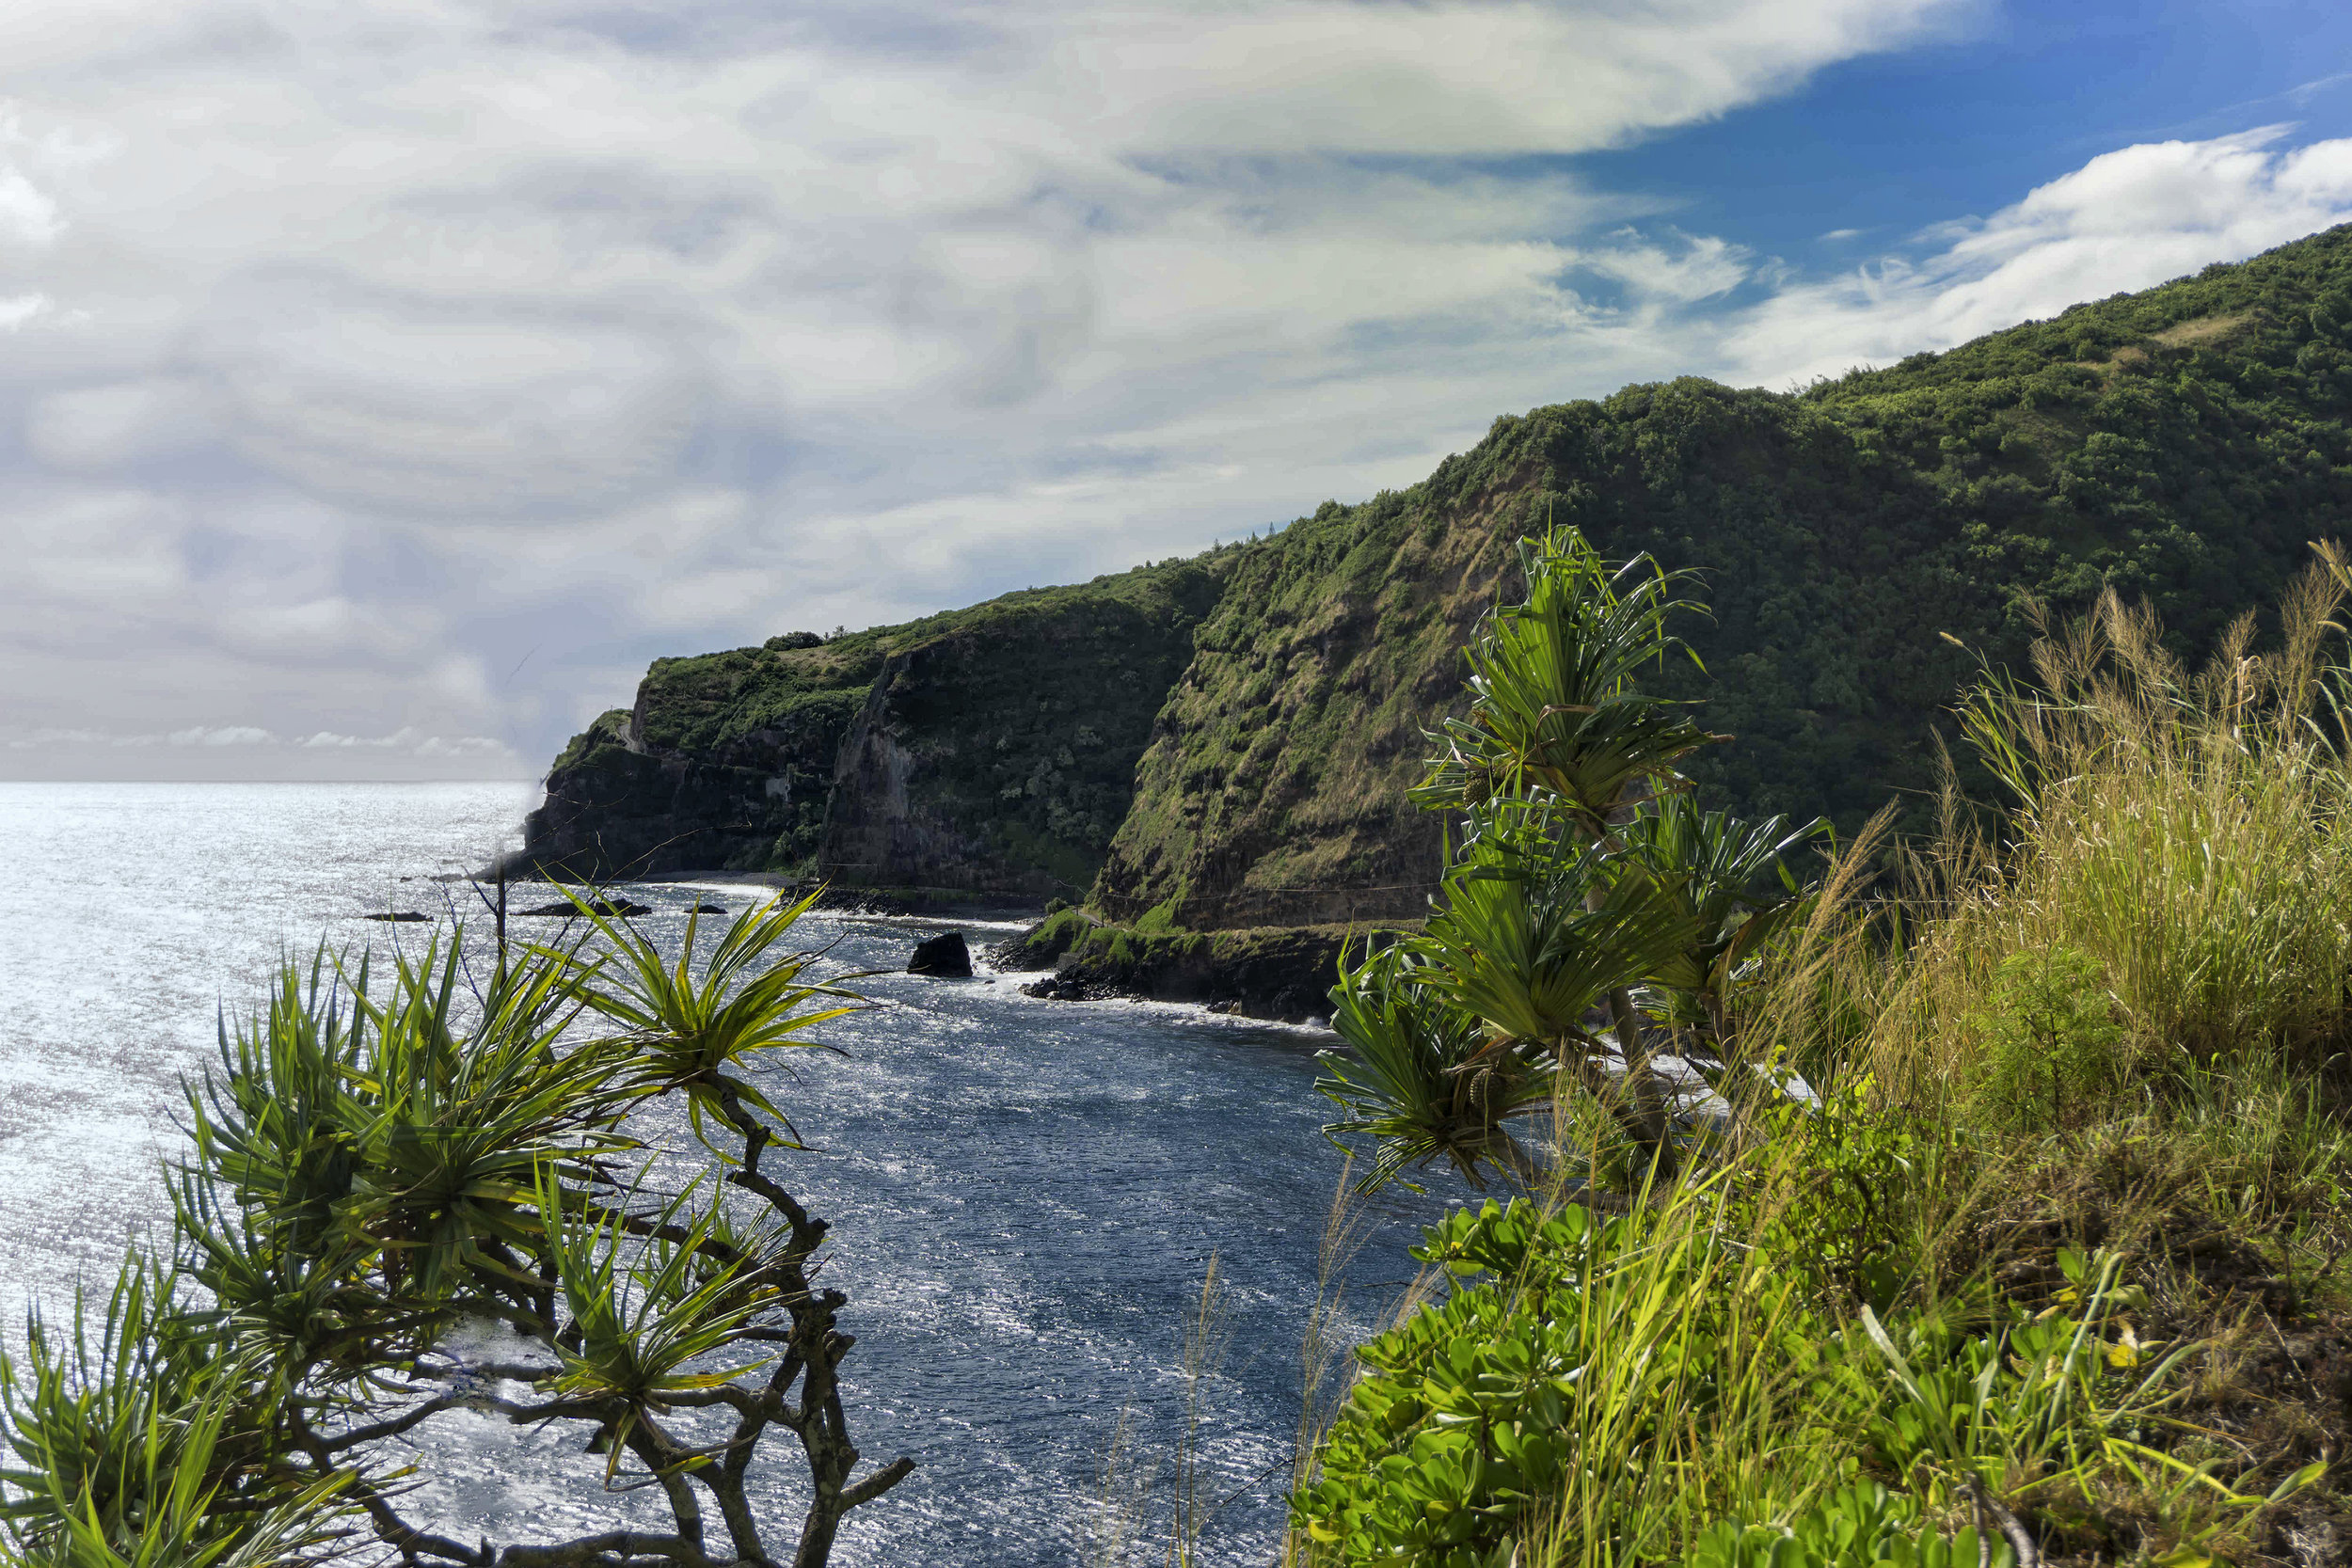 Maui Coast-4 -sized DSC03557.jpg